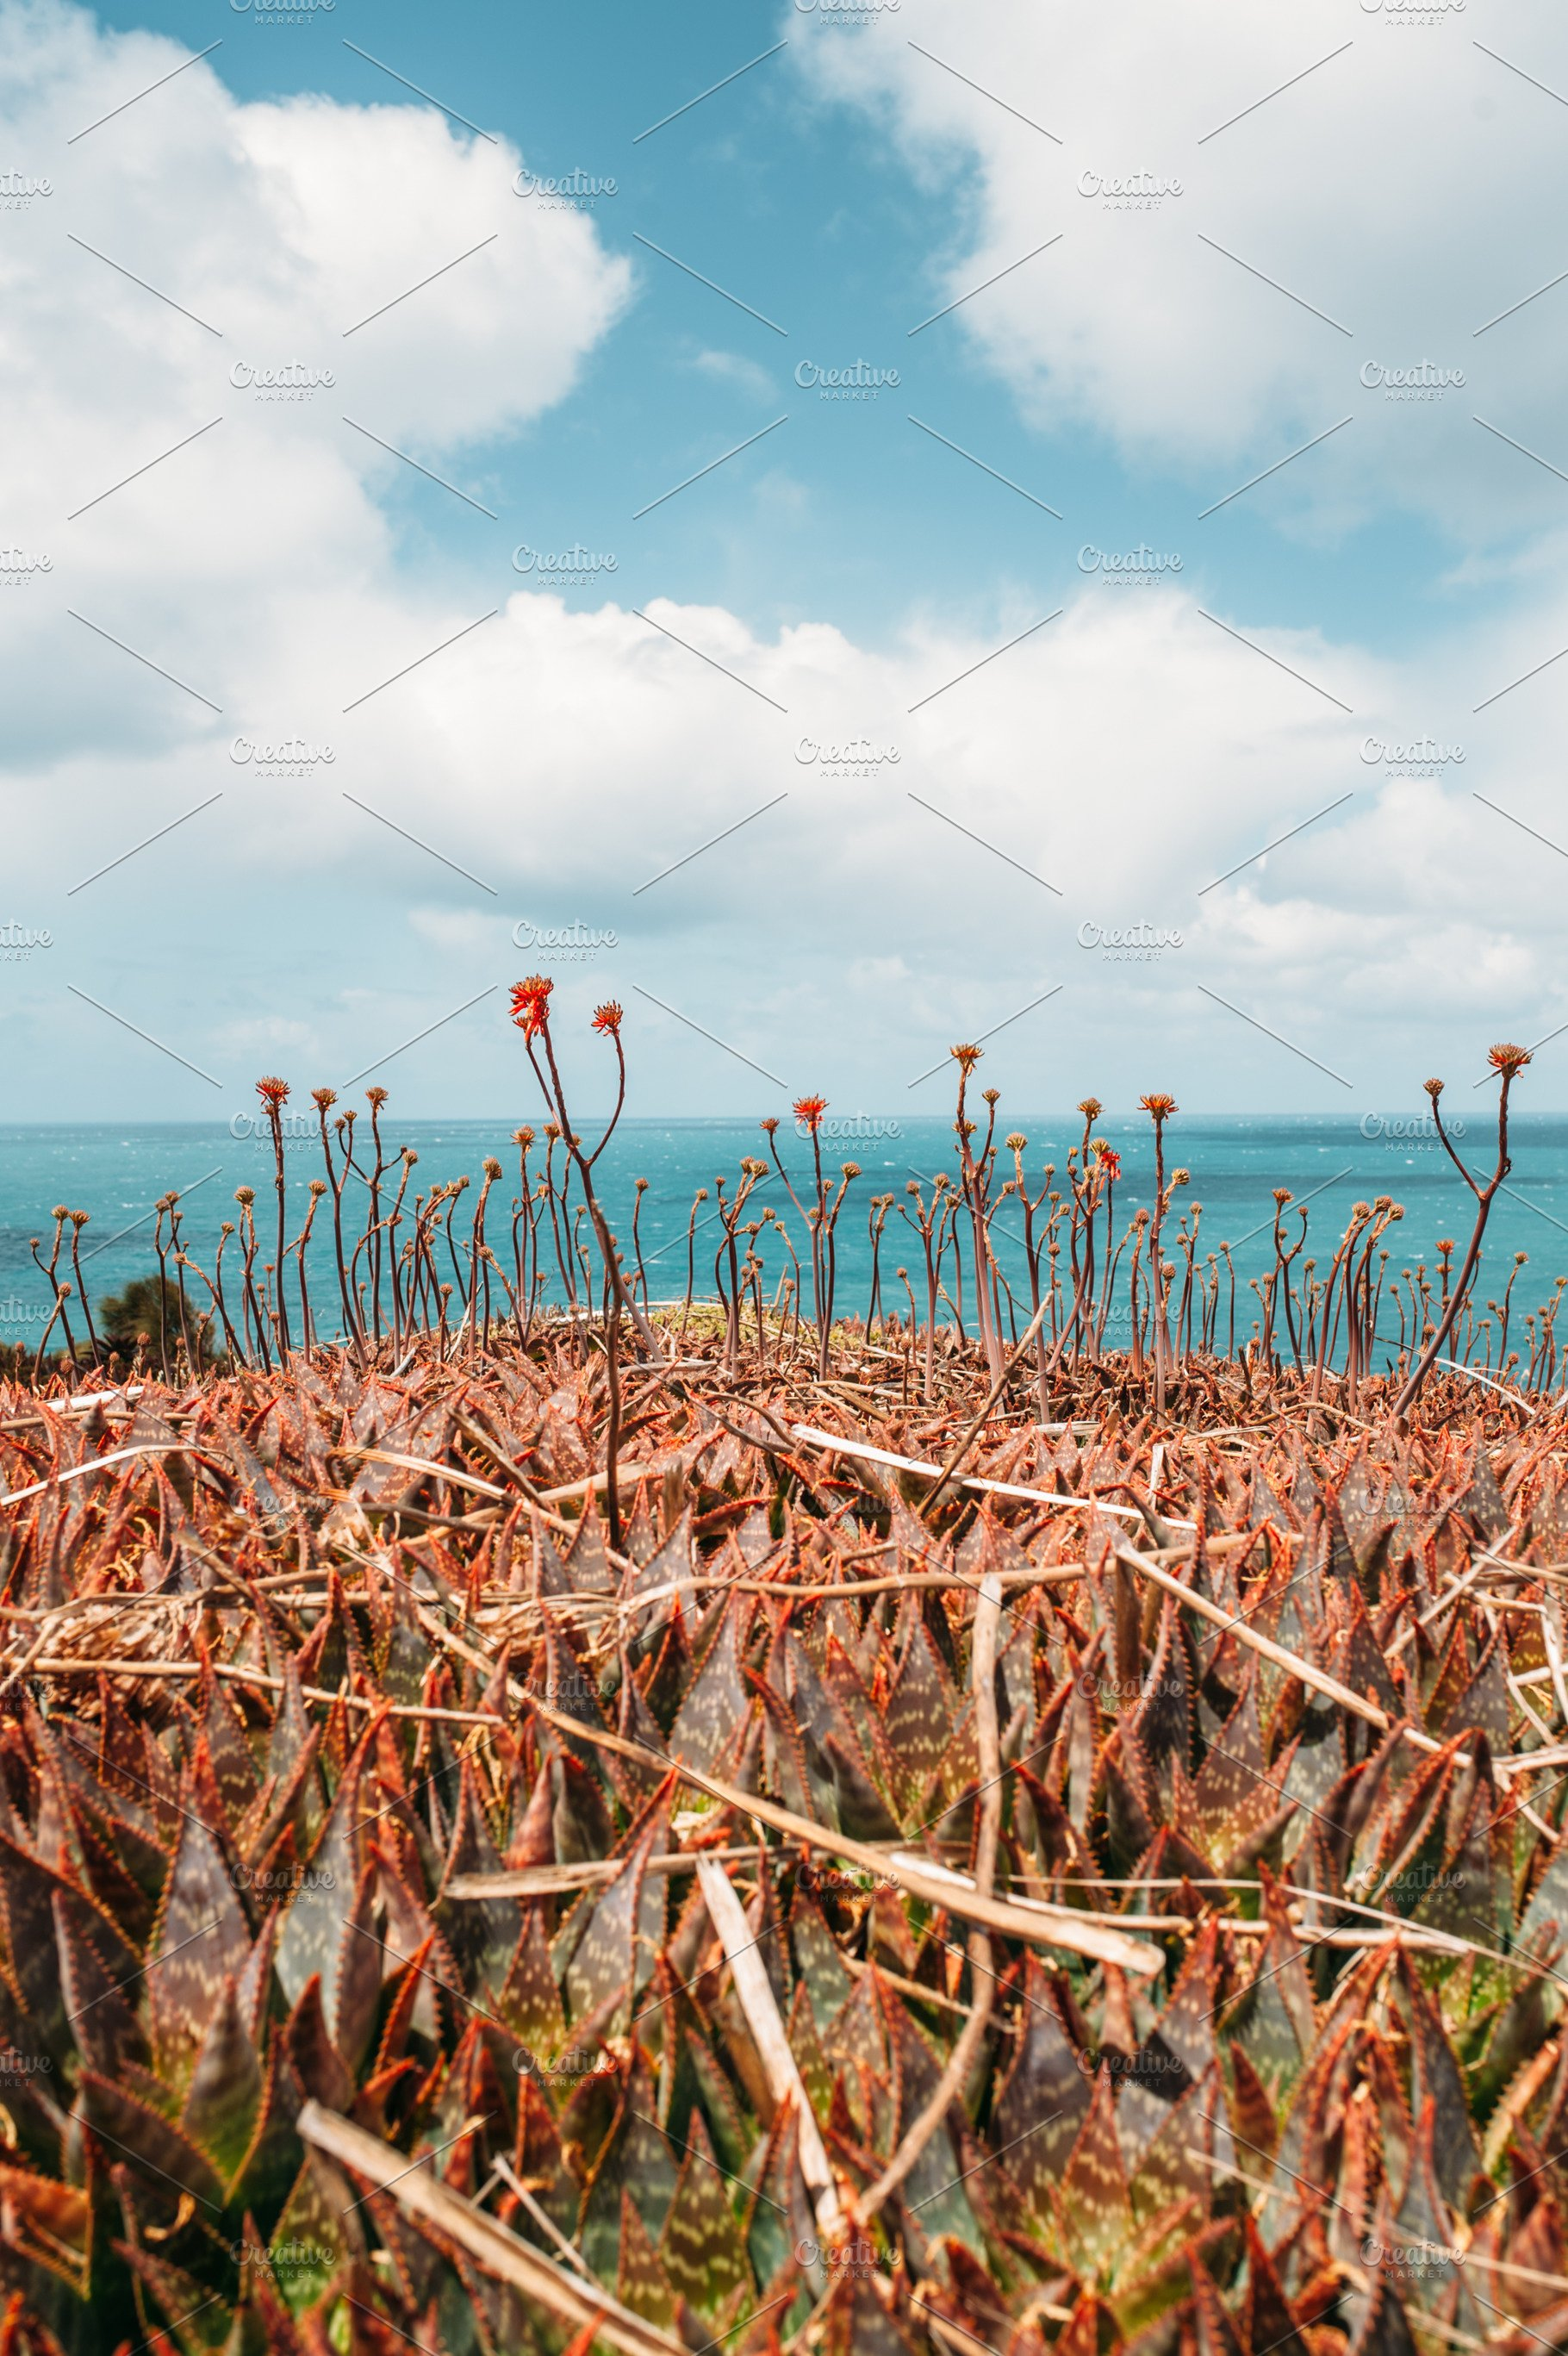 Aloe Vera flowers against blue sky